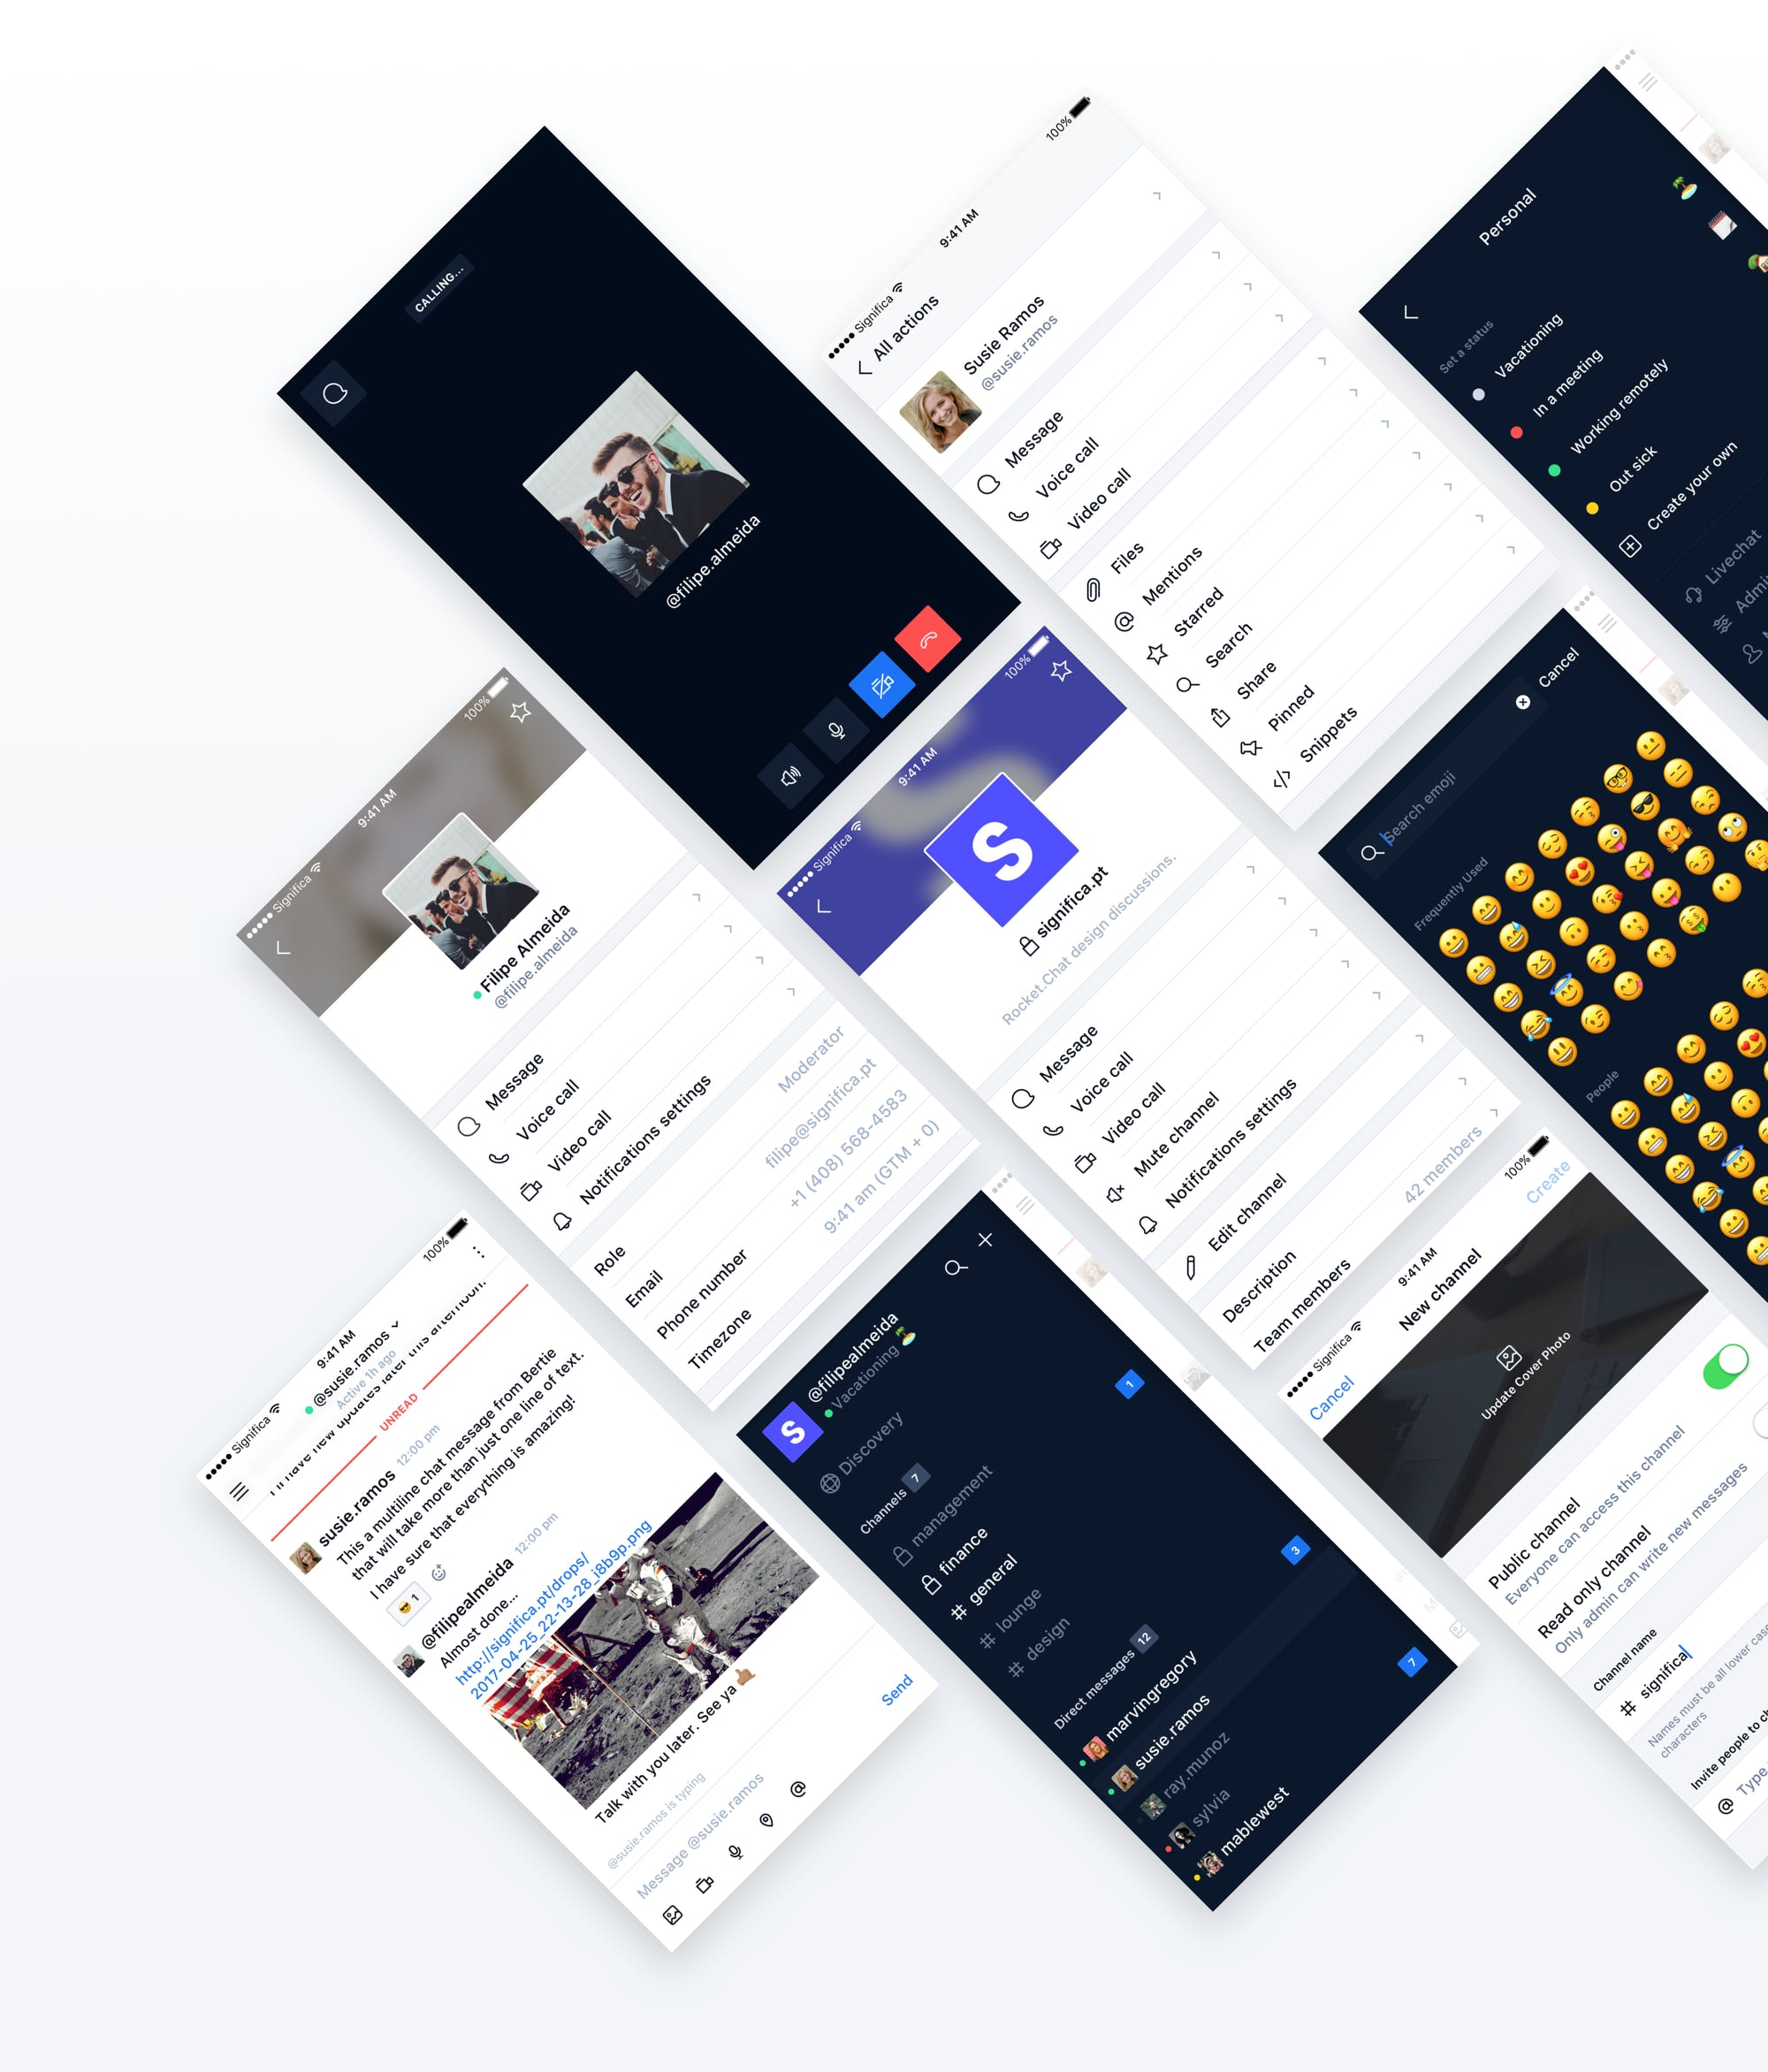 Rocket.Chat iOS App